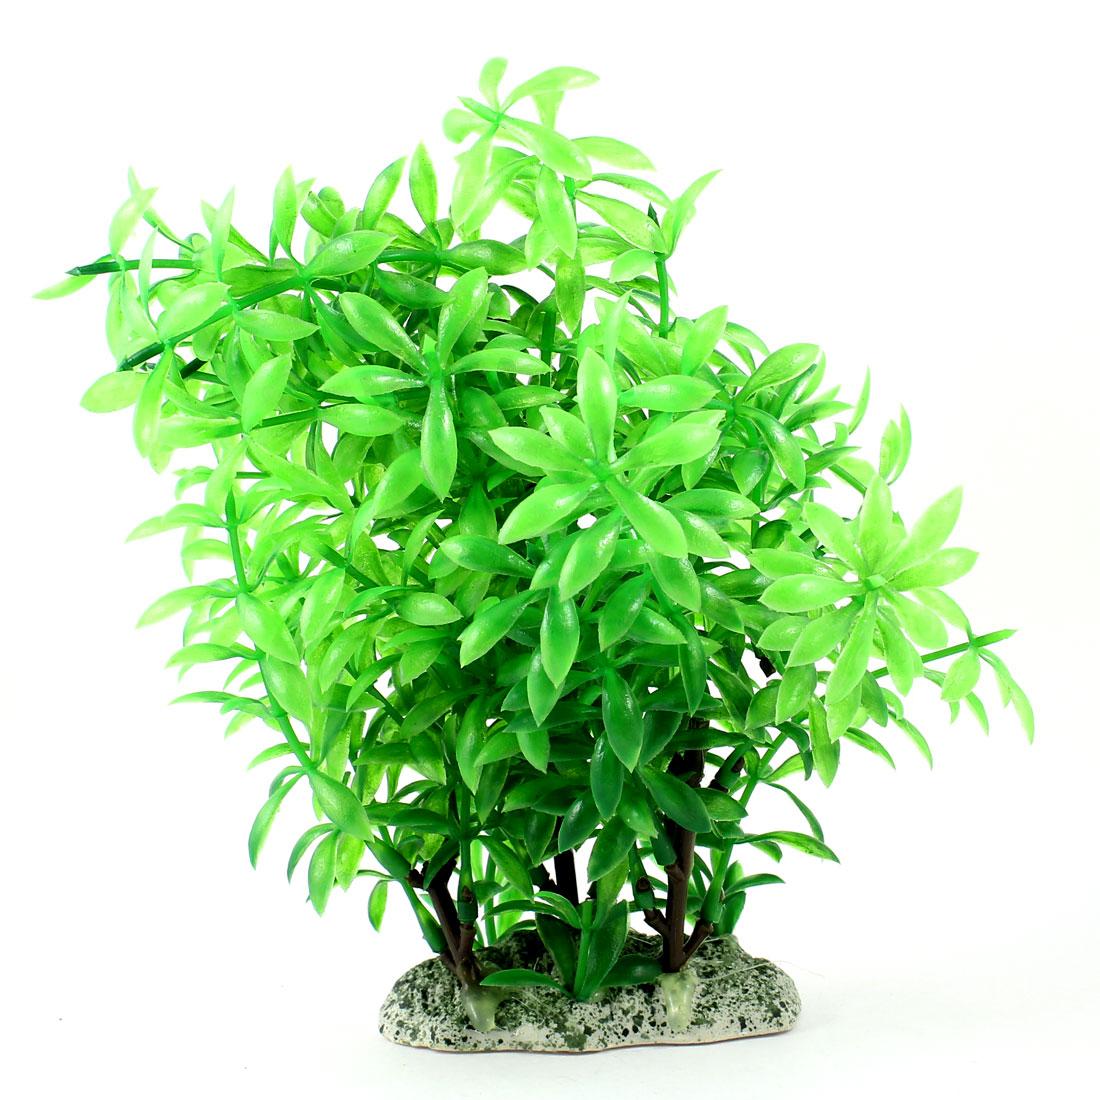 "Aquarium Fish Tank Ornament Landscaping Artificial Emulational Underwater Water Plant Grass Decor Green 6.7"" Height"